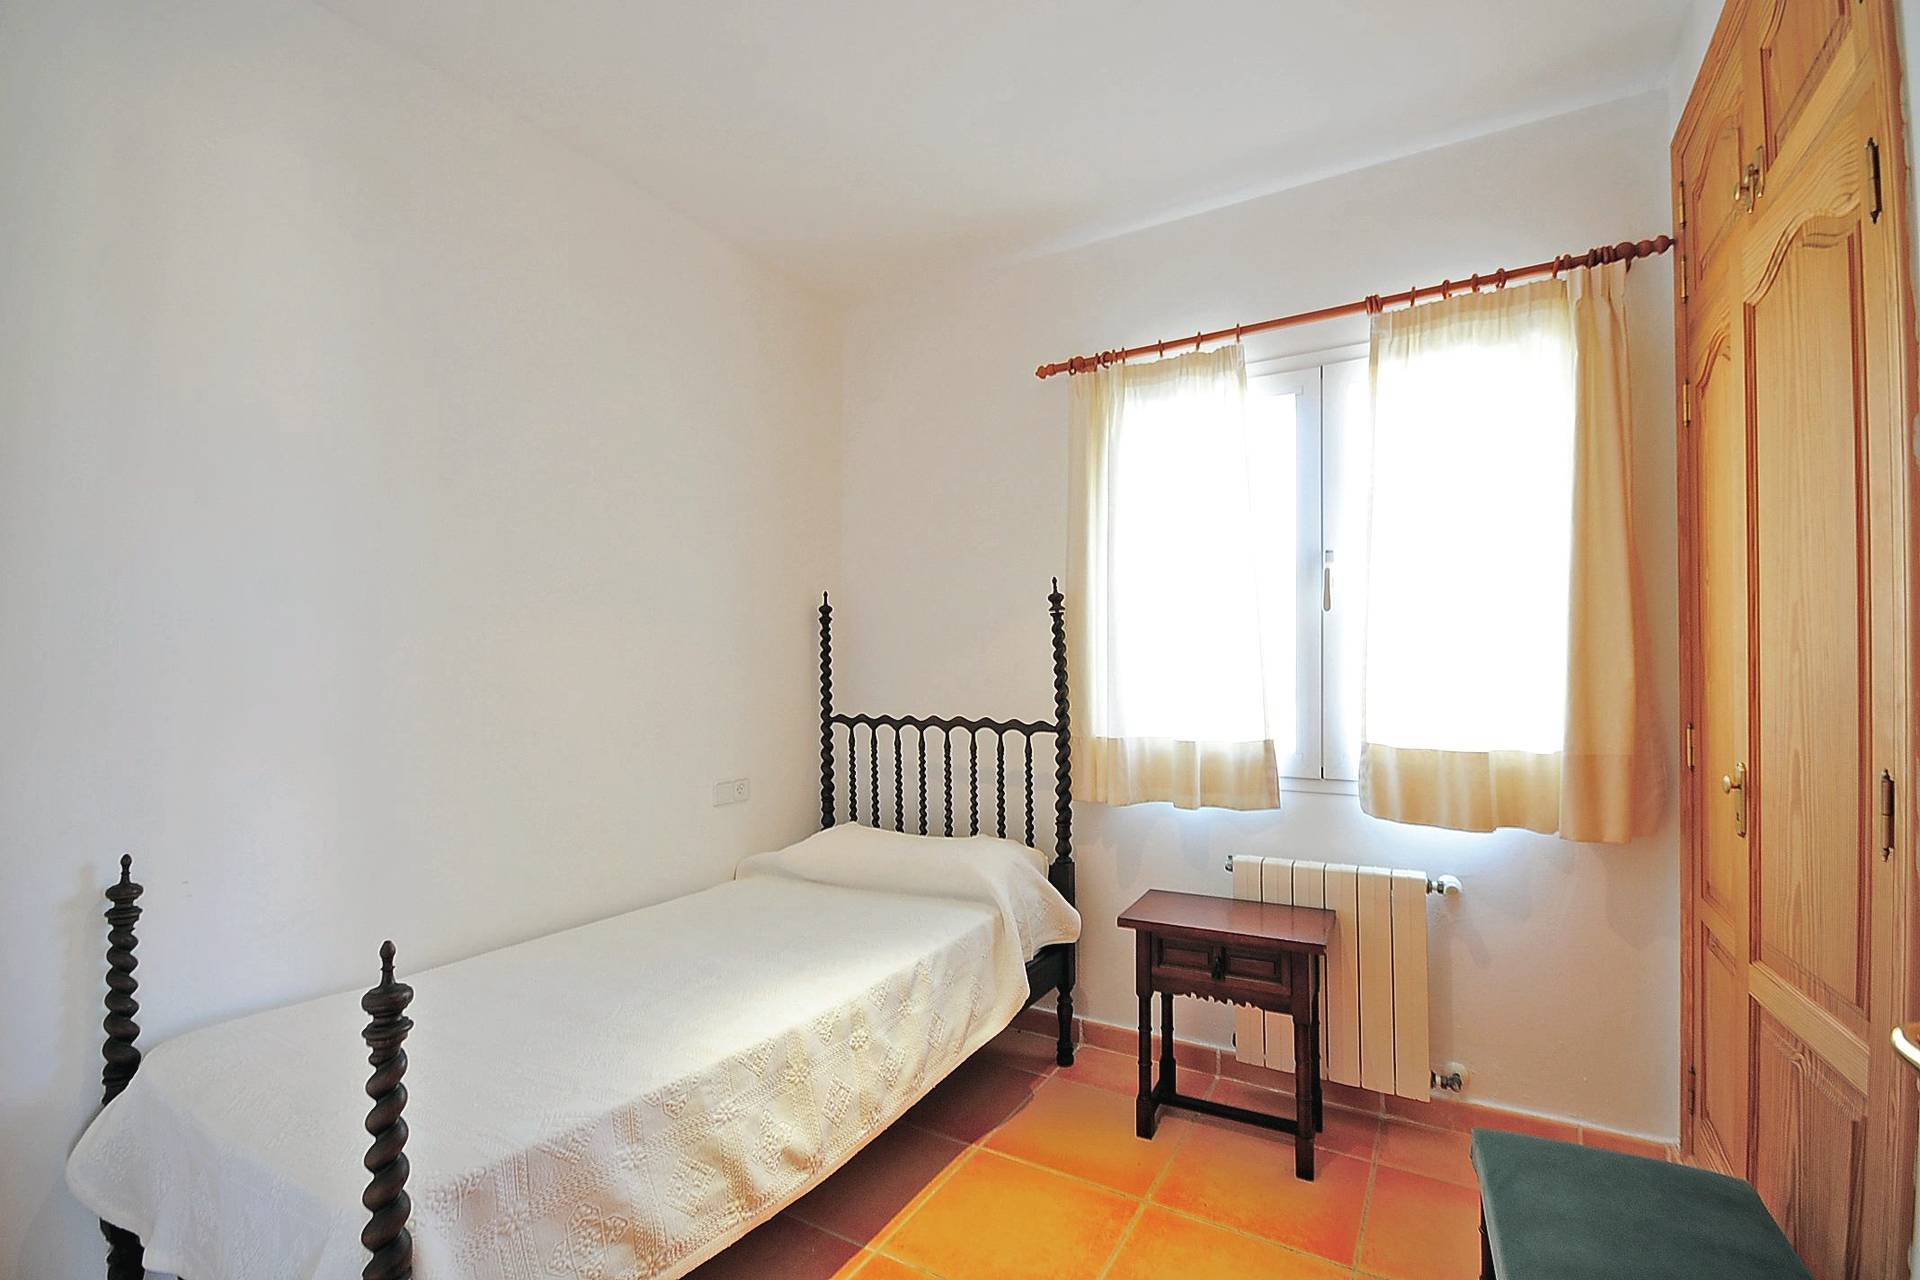 01-233 Ferienhaus am Strand Mallorca Norden Bild 22